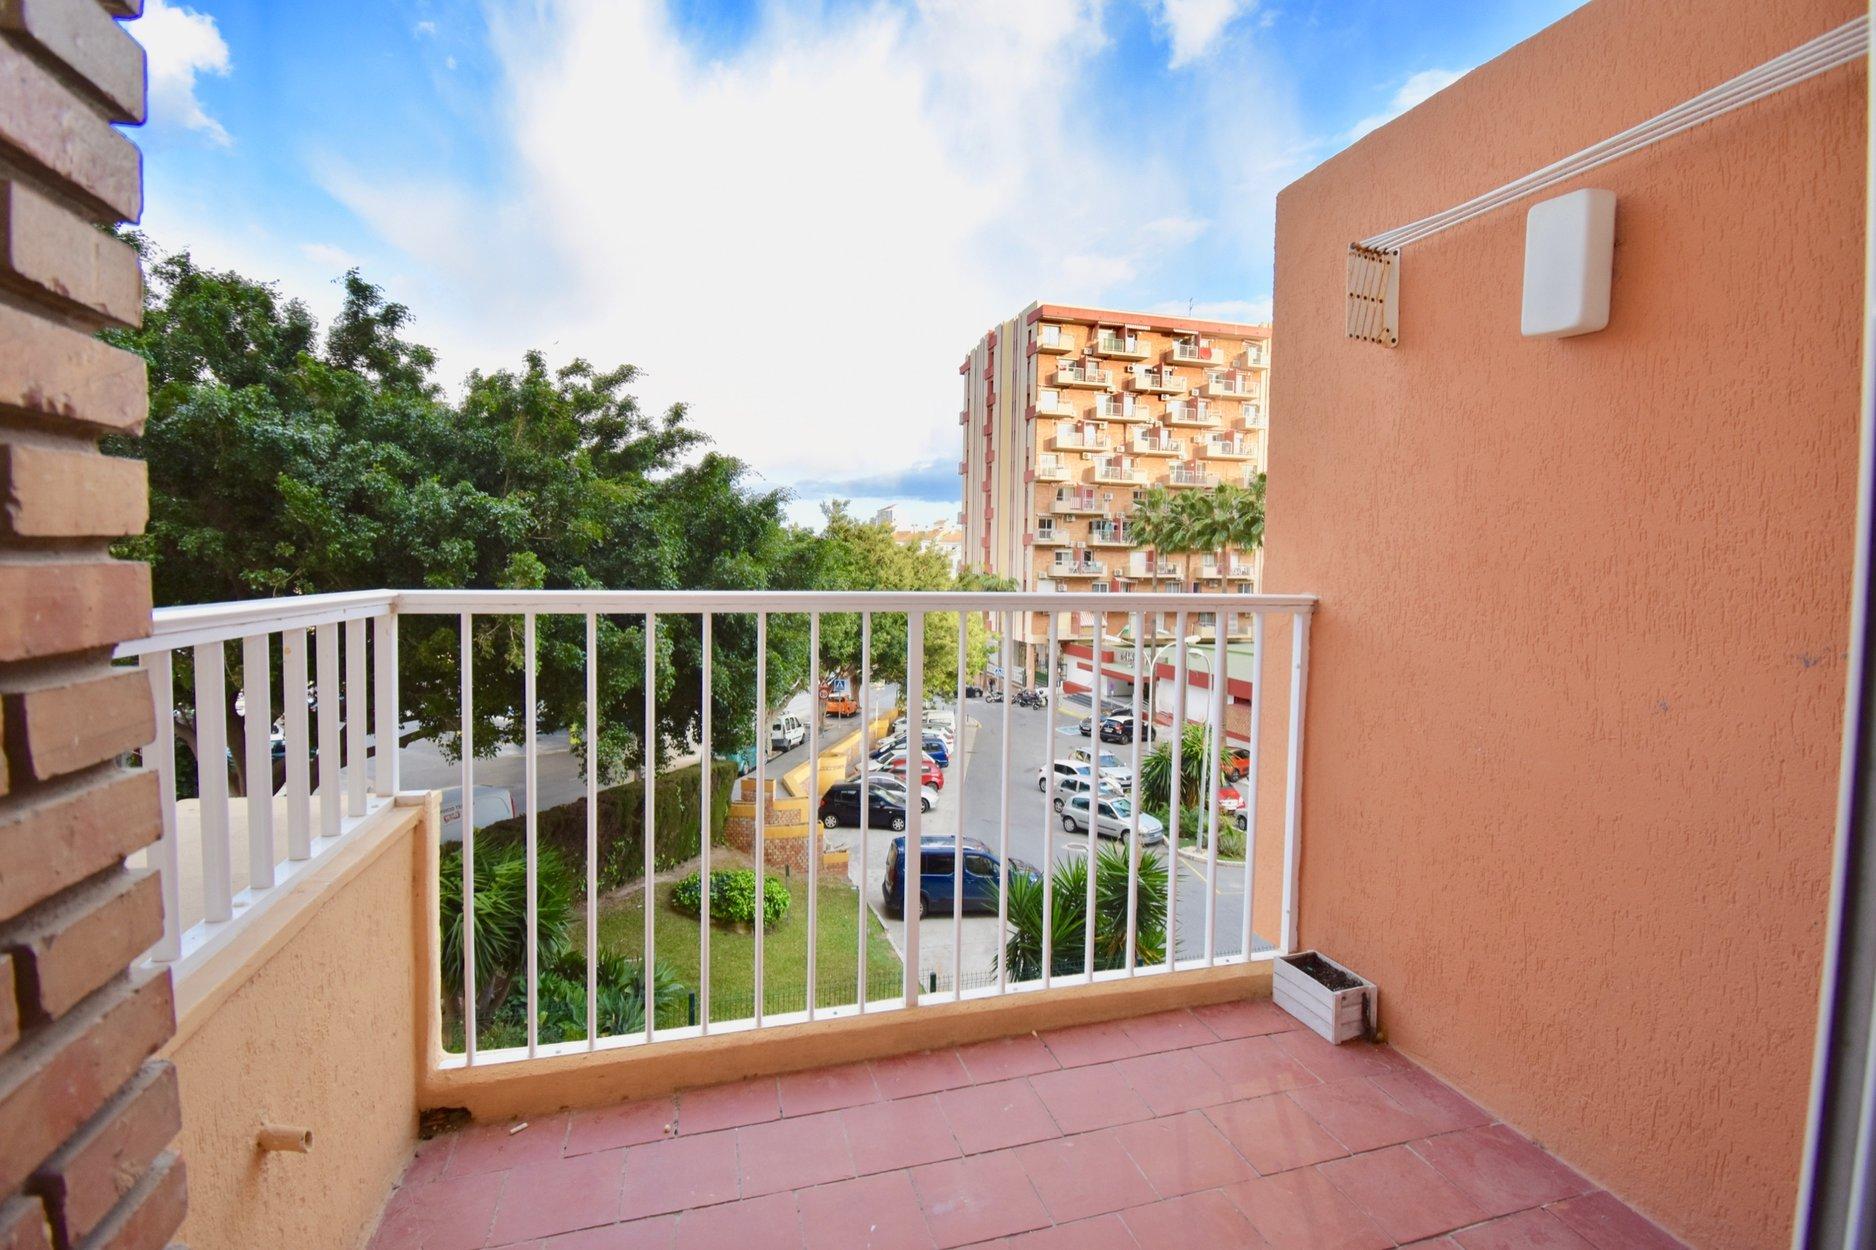 Apartment for sale in Benalmádena - Málaga